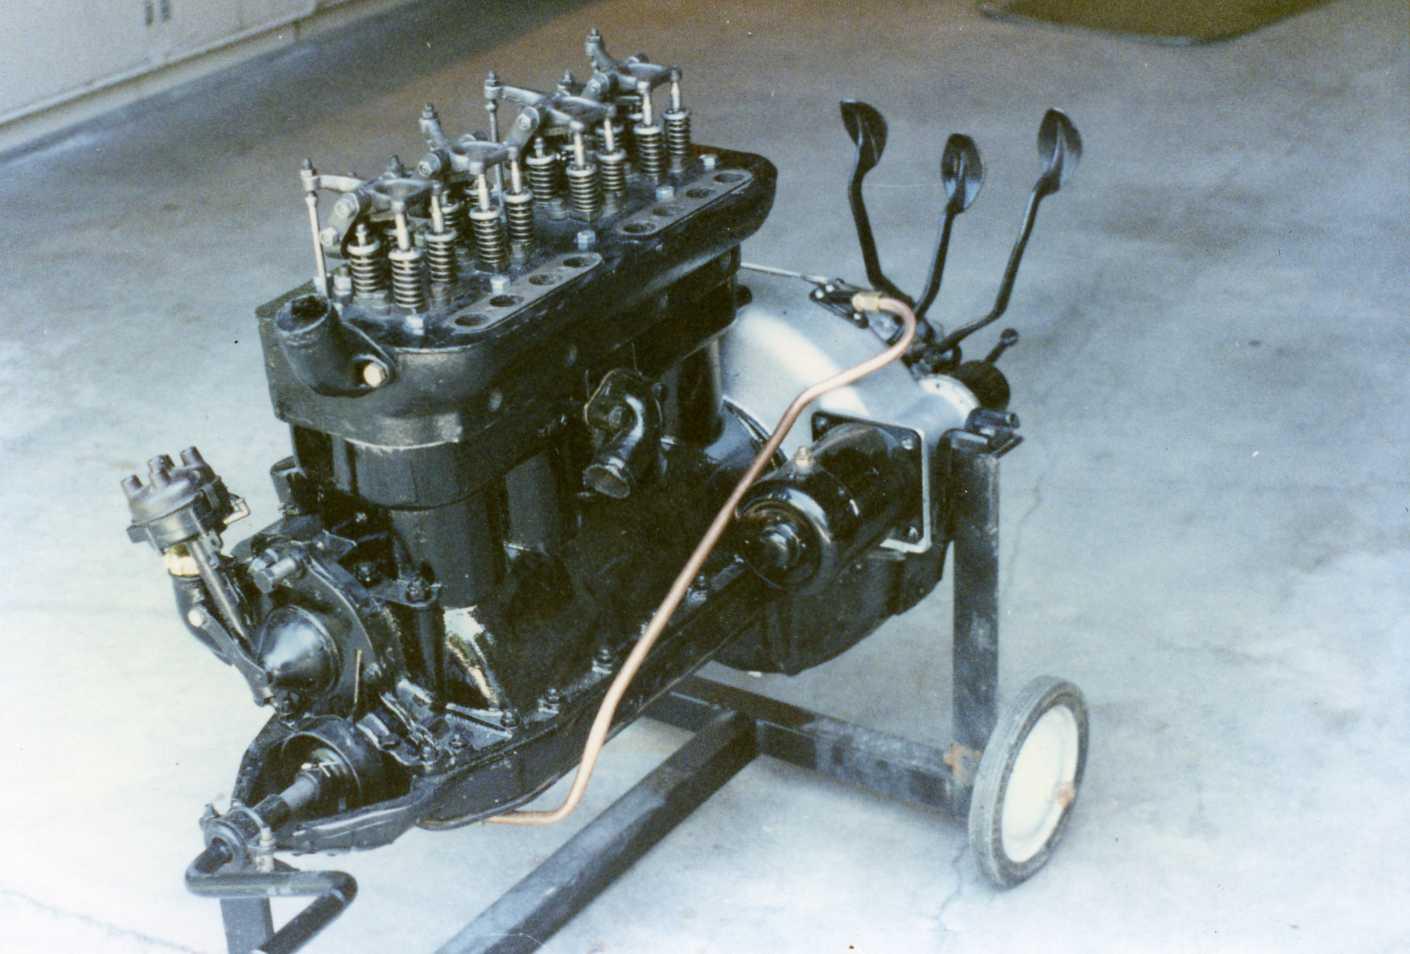 engine asembly